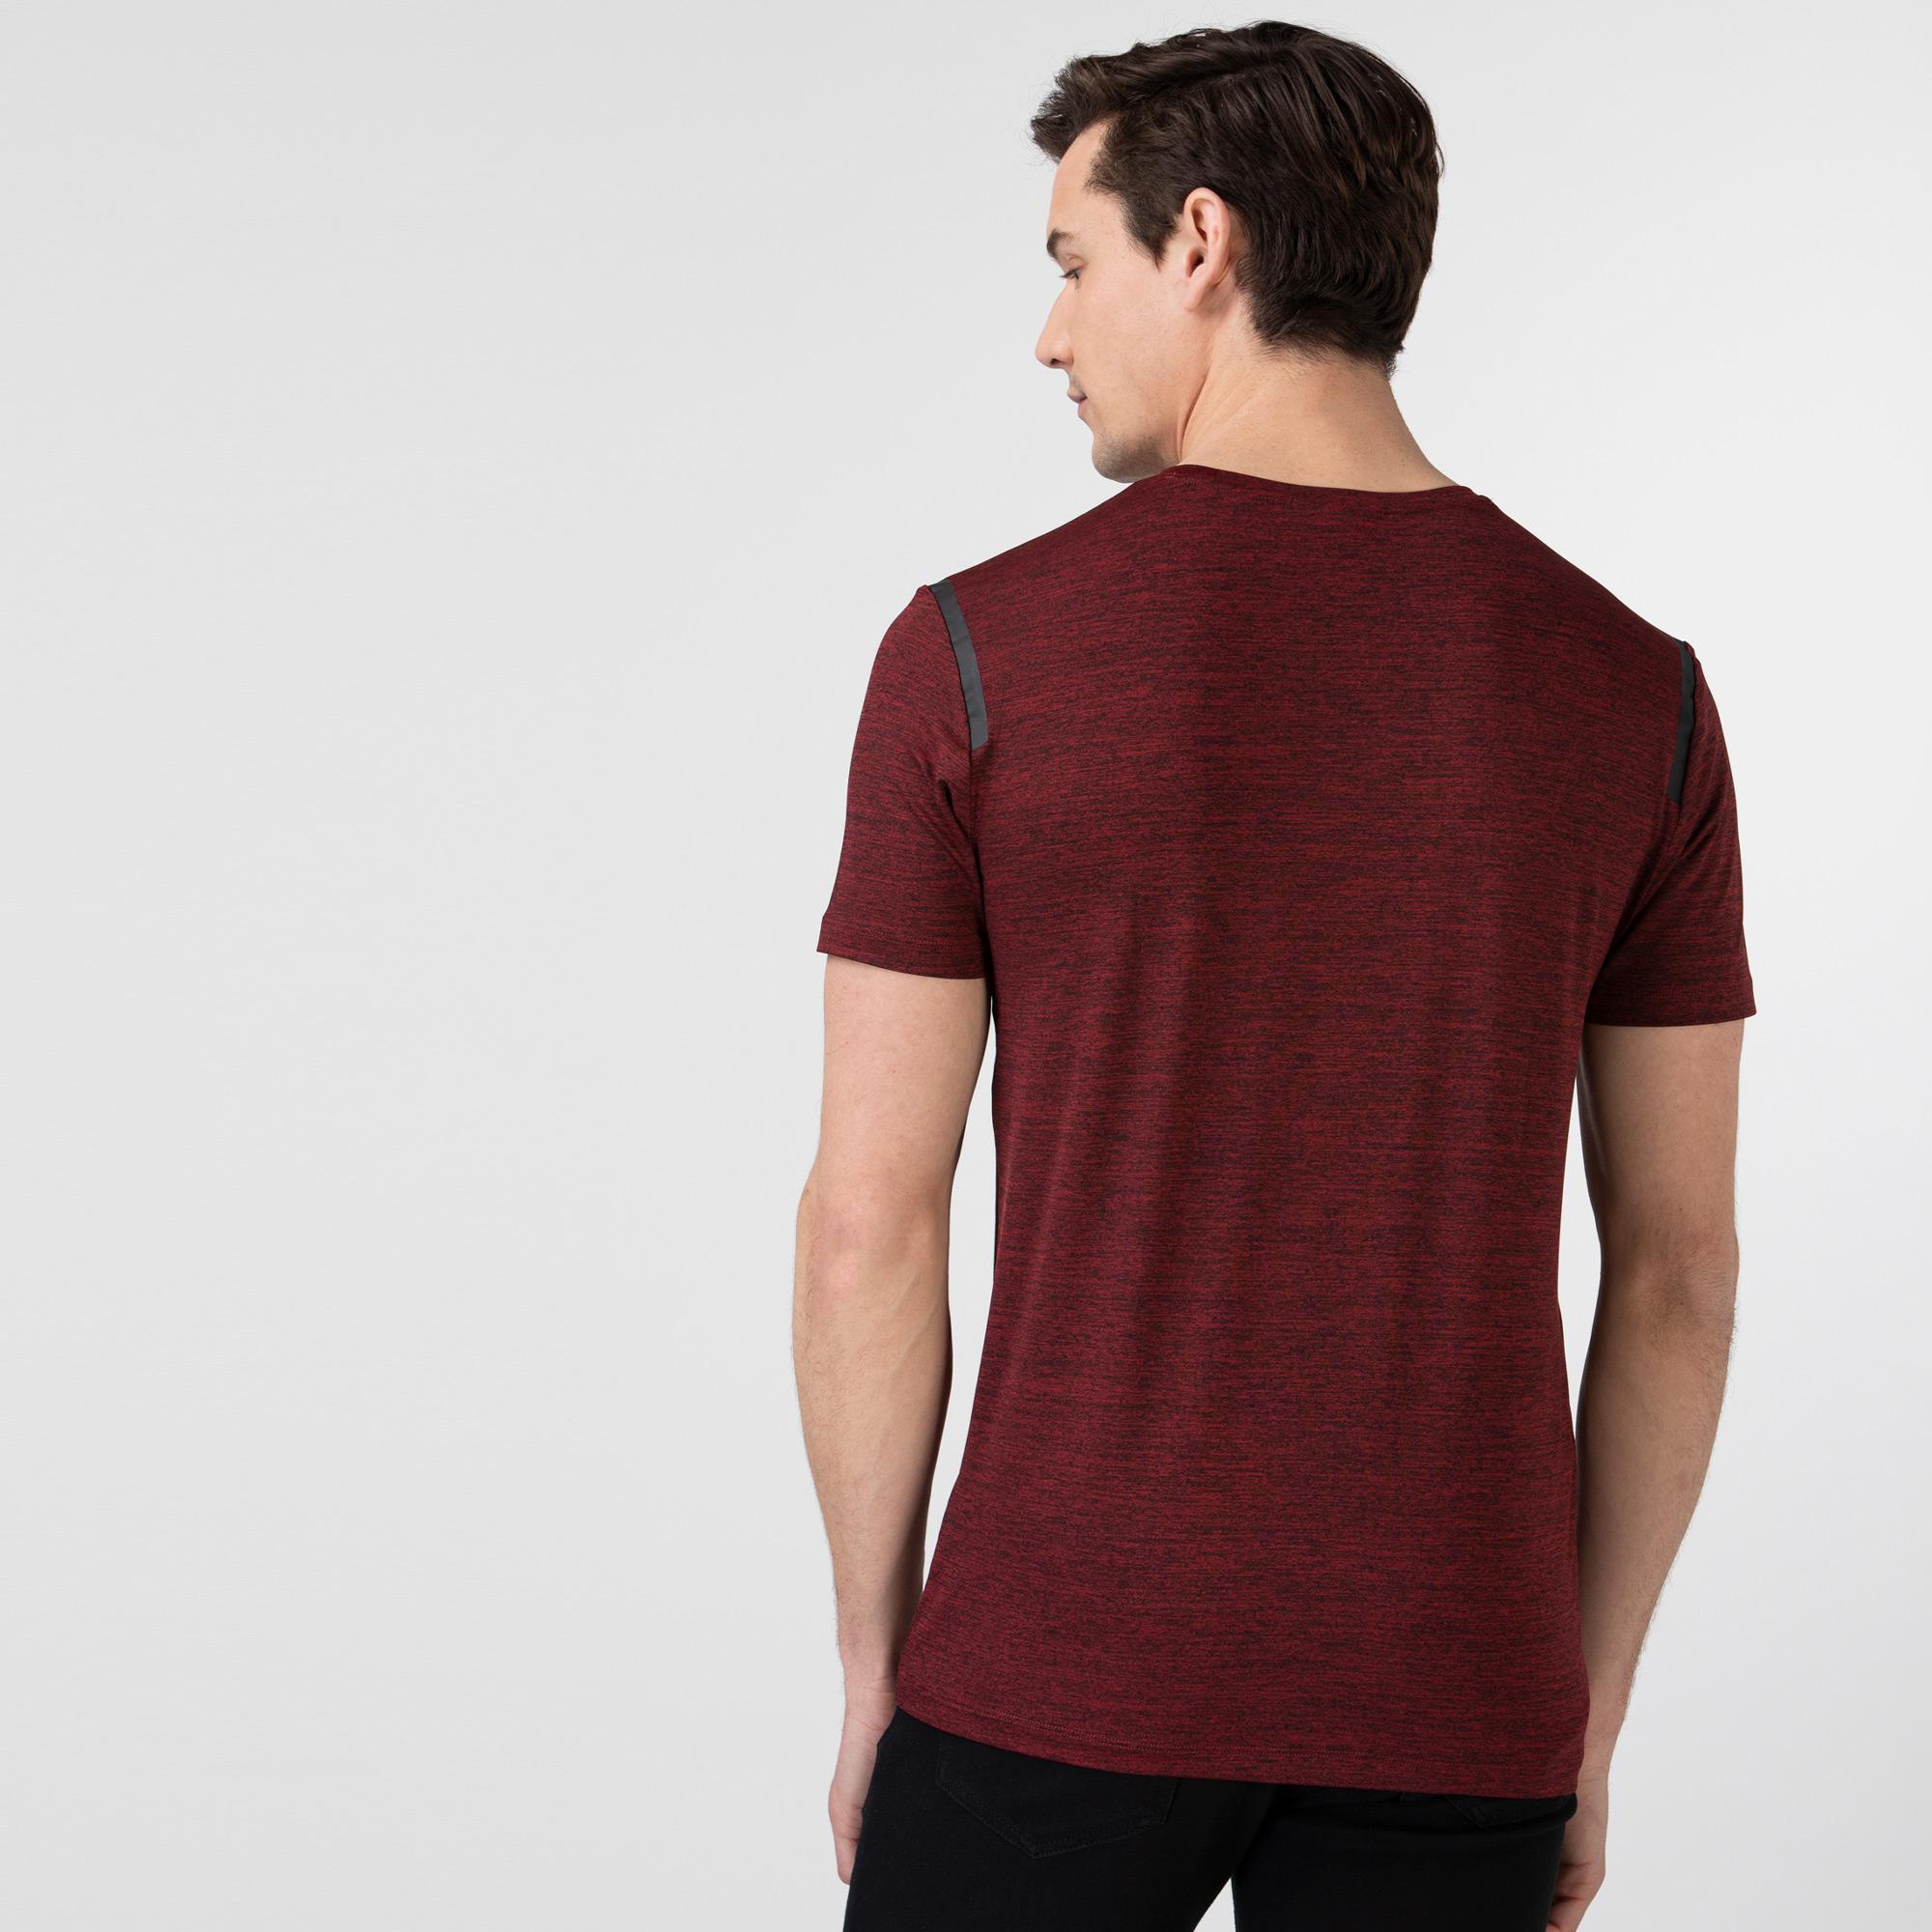 Lacoste Erkek Slim Fit Bisiklet Yaka Baskılı Bordo T-Shirt